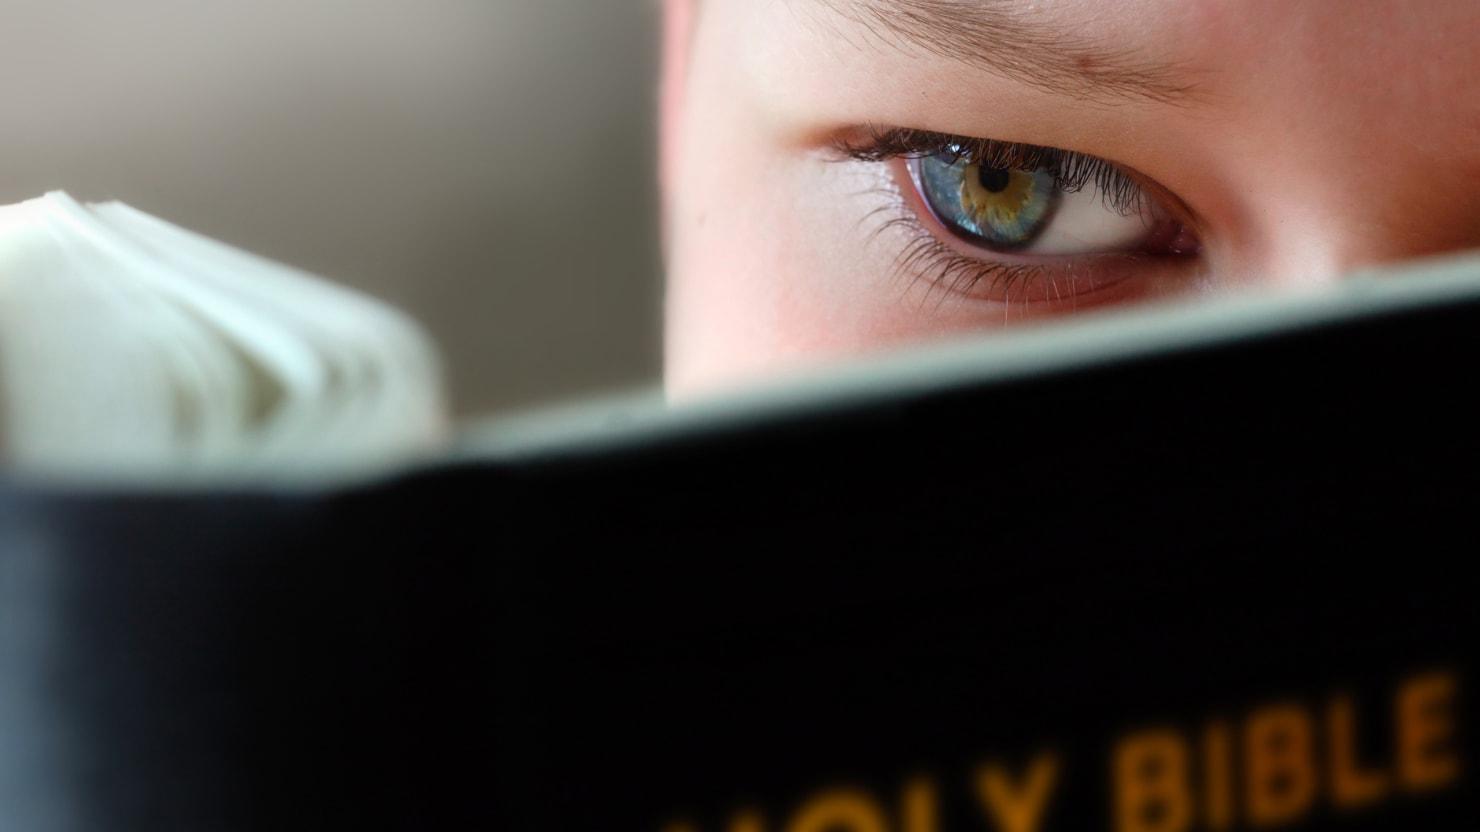 Can Christians Still Go to Harvard?